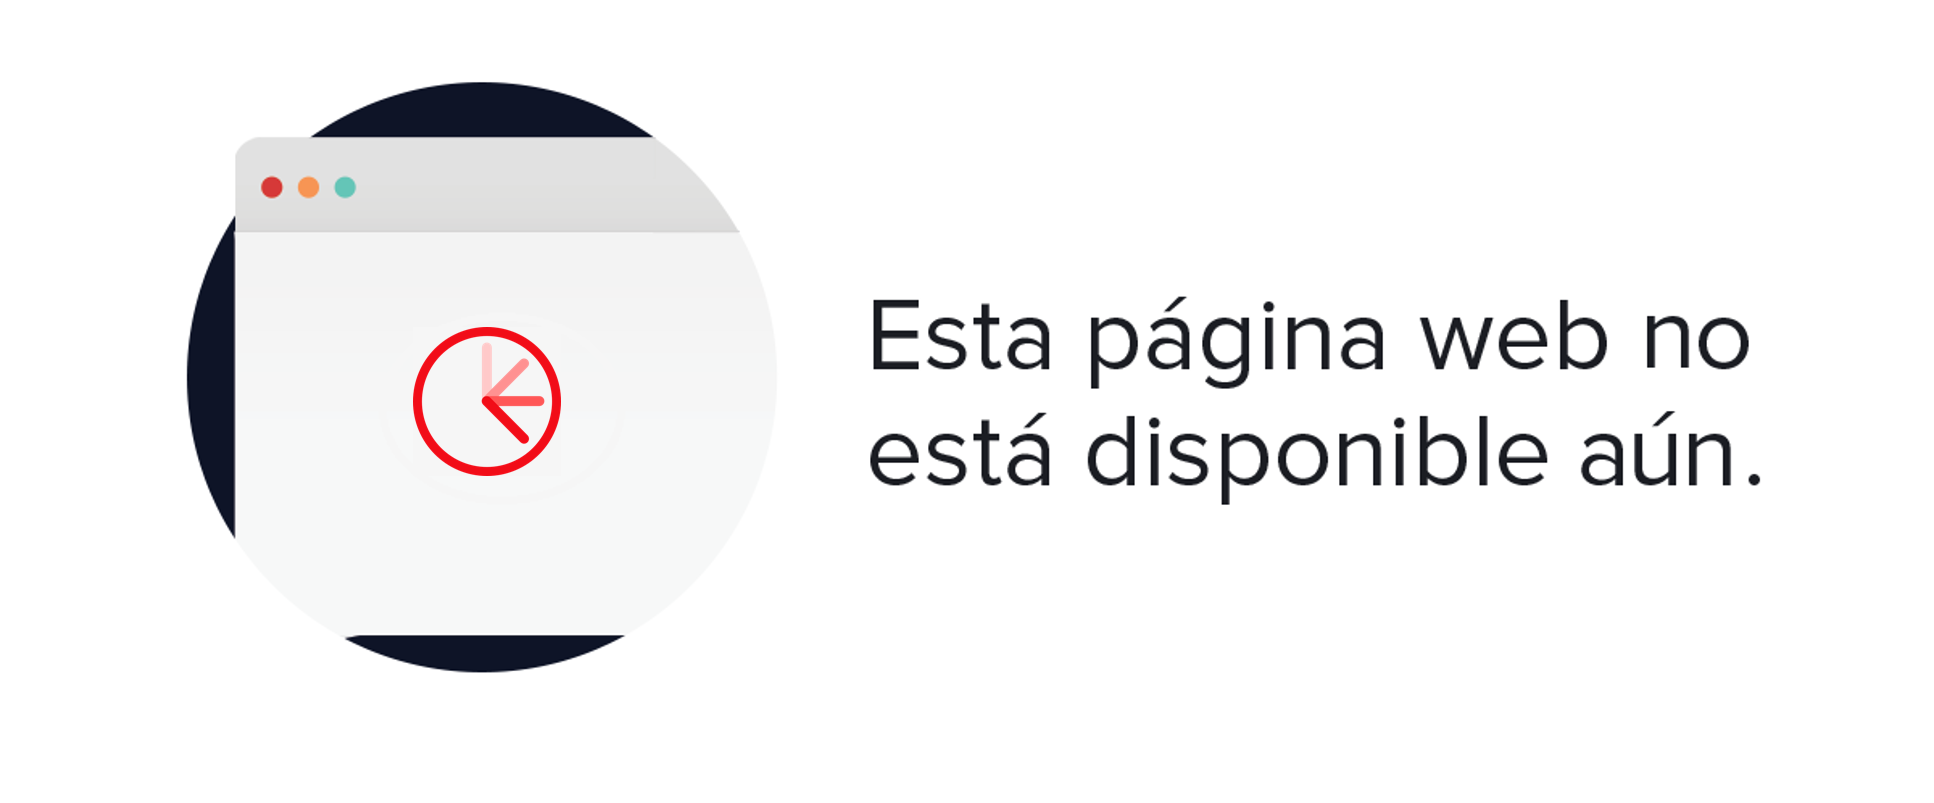 Ama Brand Beige Zapatillas Deportivas Hombre 445969 - Barato - LFKCIIU